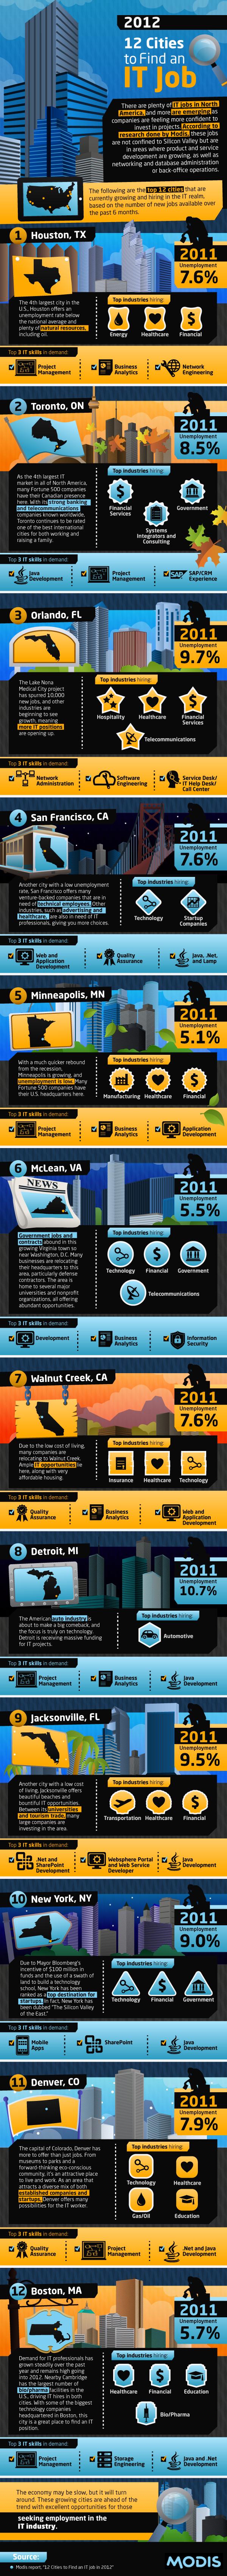 IT-job-2012-americamodiscom